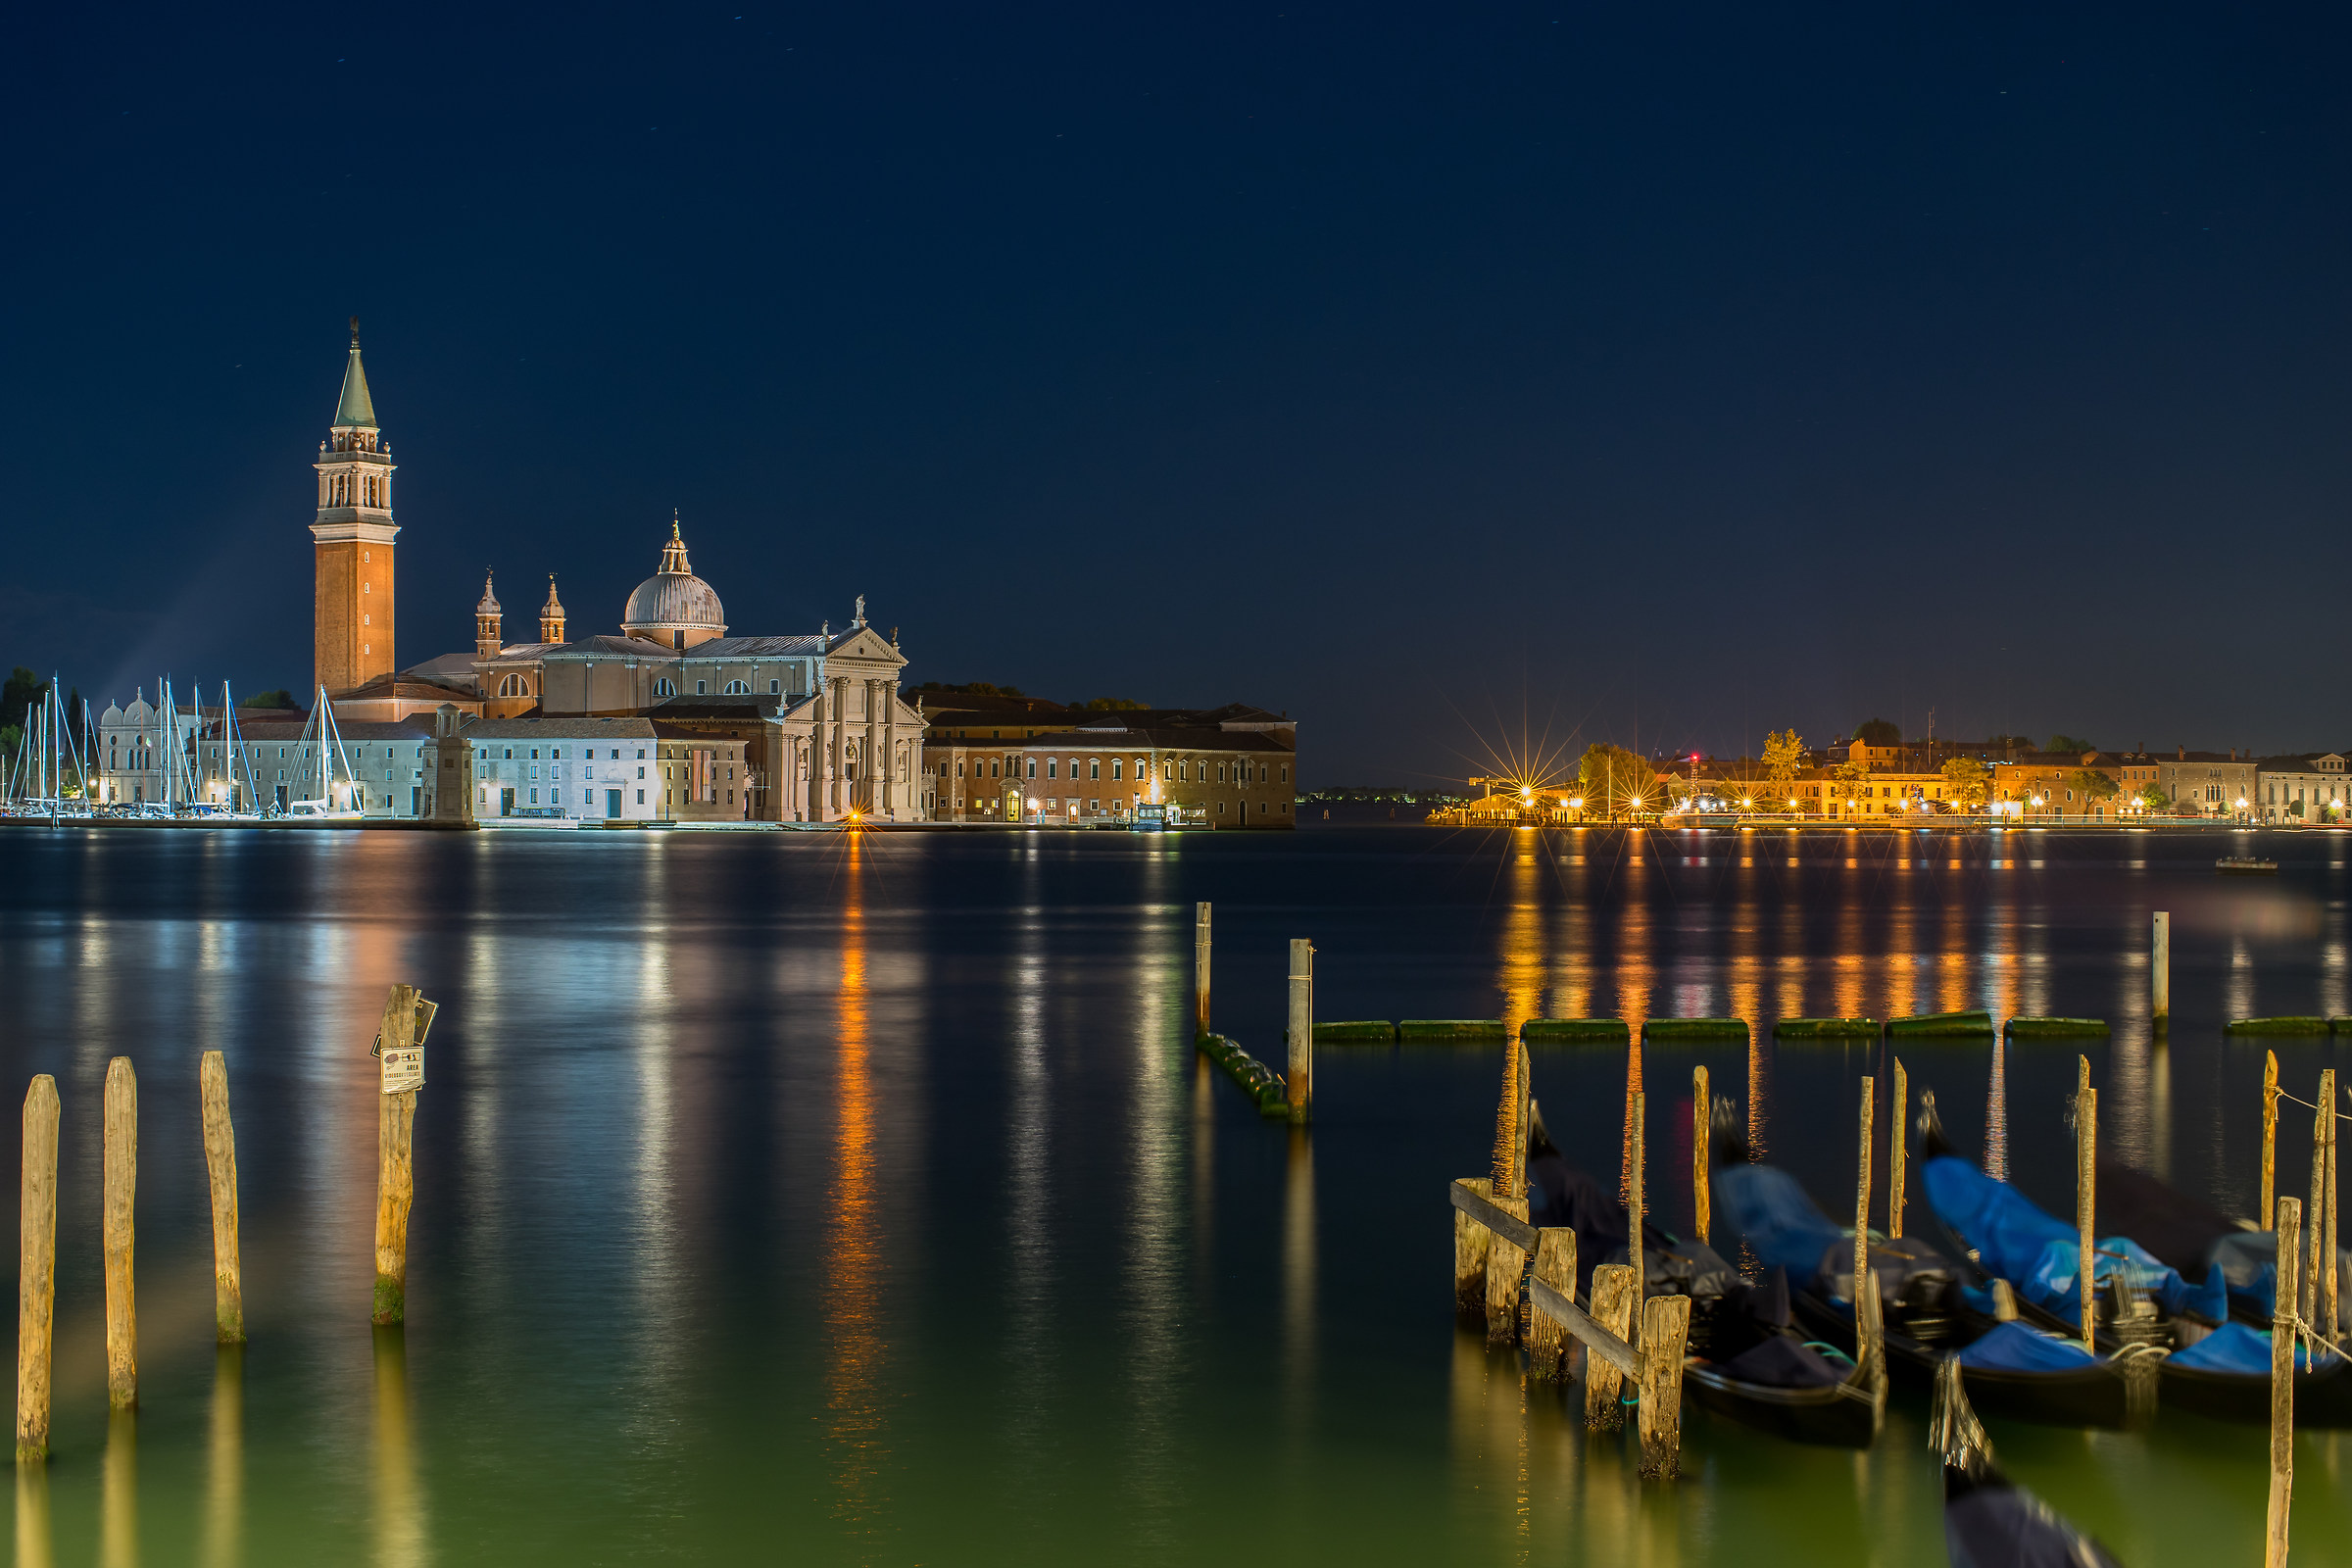 Venice at night...